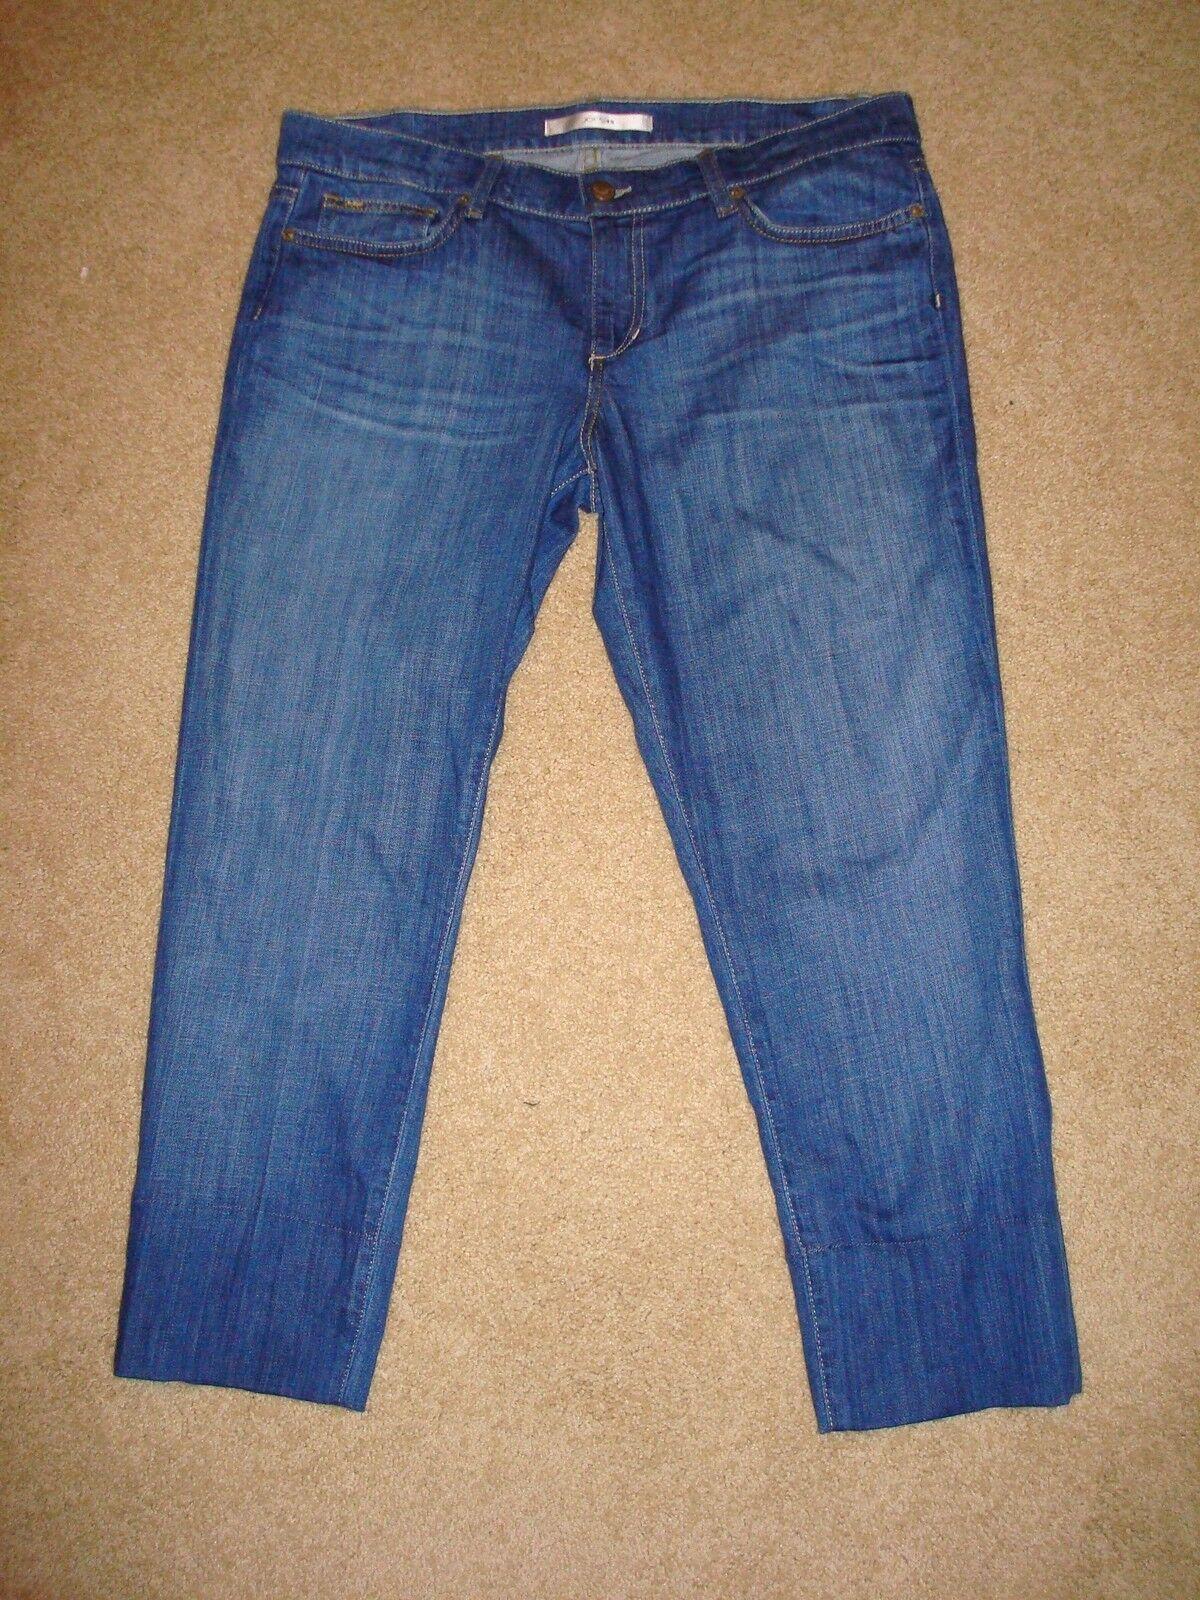 NWT Joe's Jeans Capri SX4241K Coppola  152 - 31